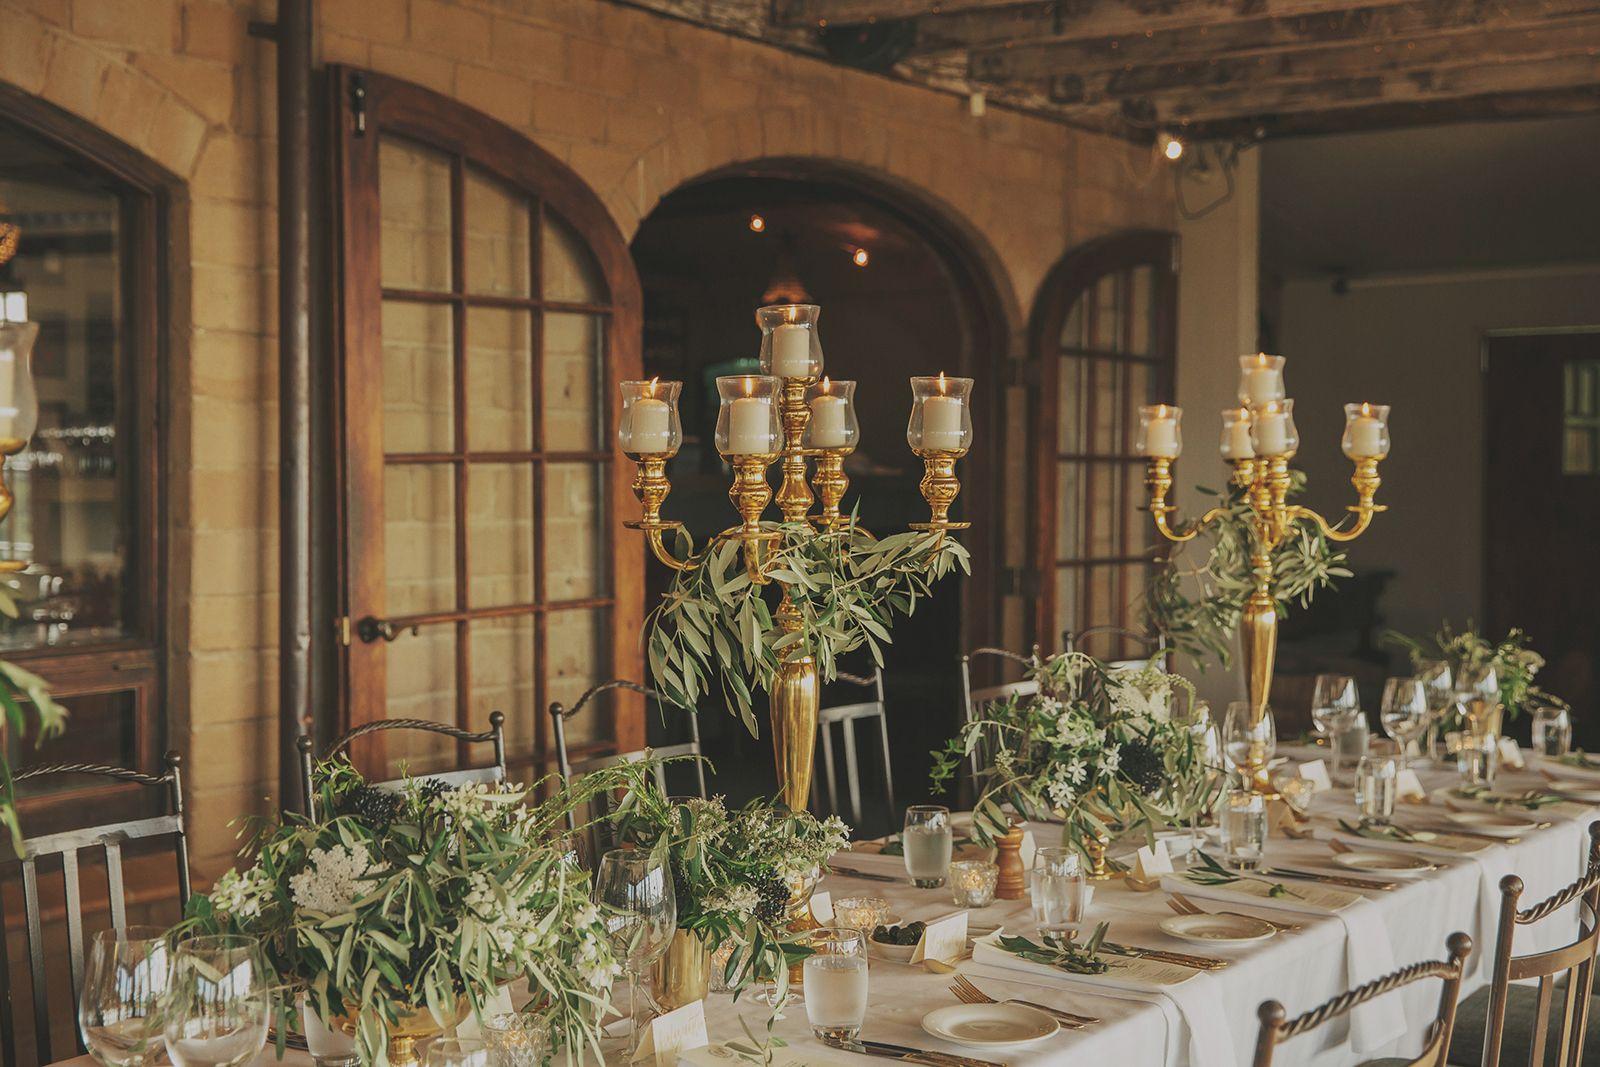 Wedding night decoration ideas  Pin by Pin Gal on Wedding Reception Ceremony  Pinterest  Tuscan